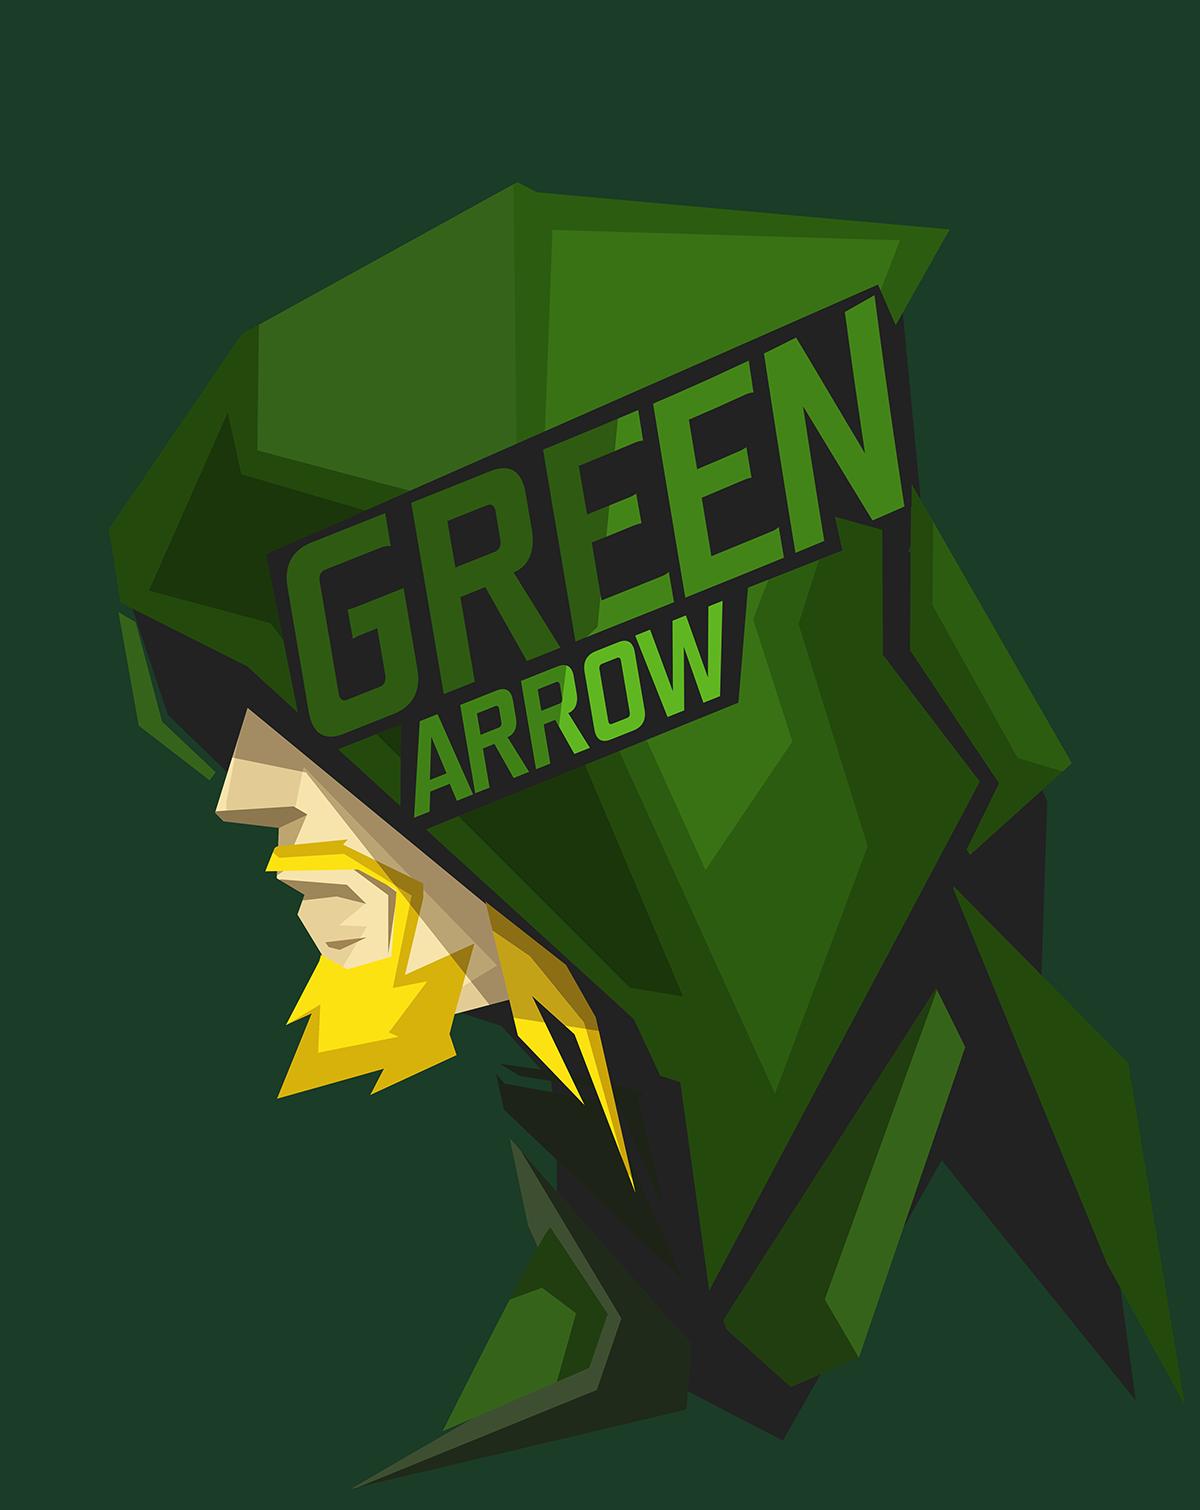 wallpaper : illustration, logo, green, cartoon, superhero, dc comics